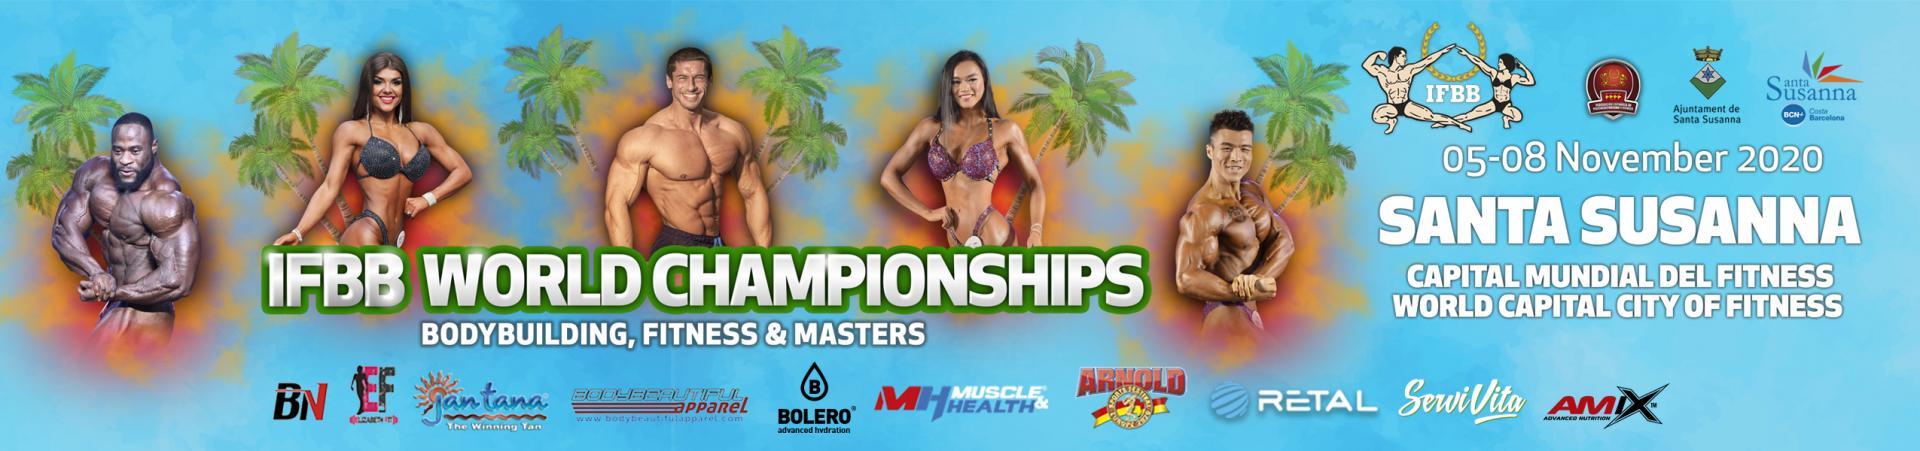 Banner ifbb world bodybuilding fitness master championhips 2020